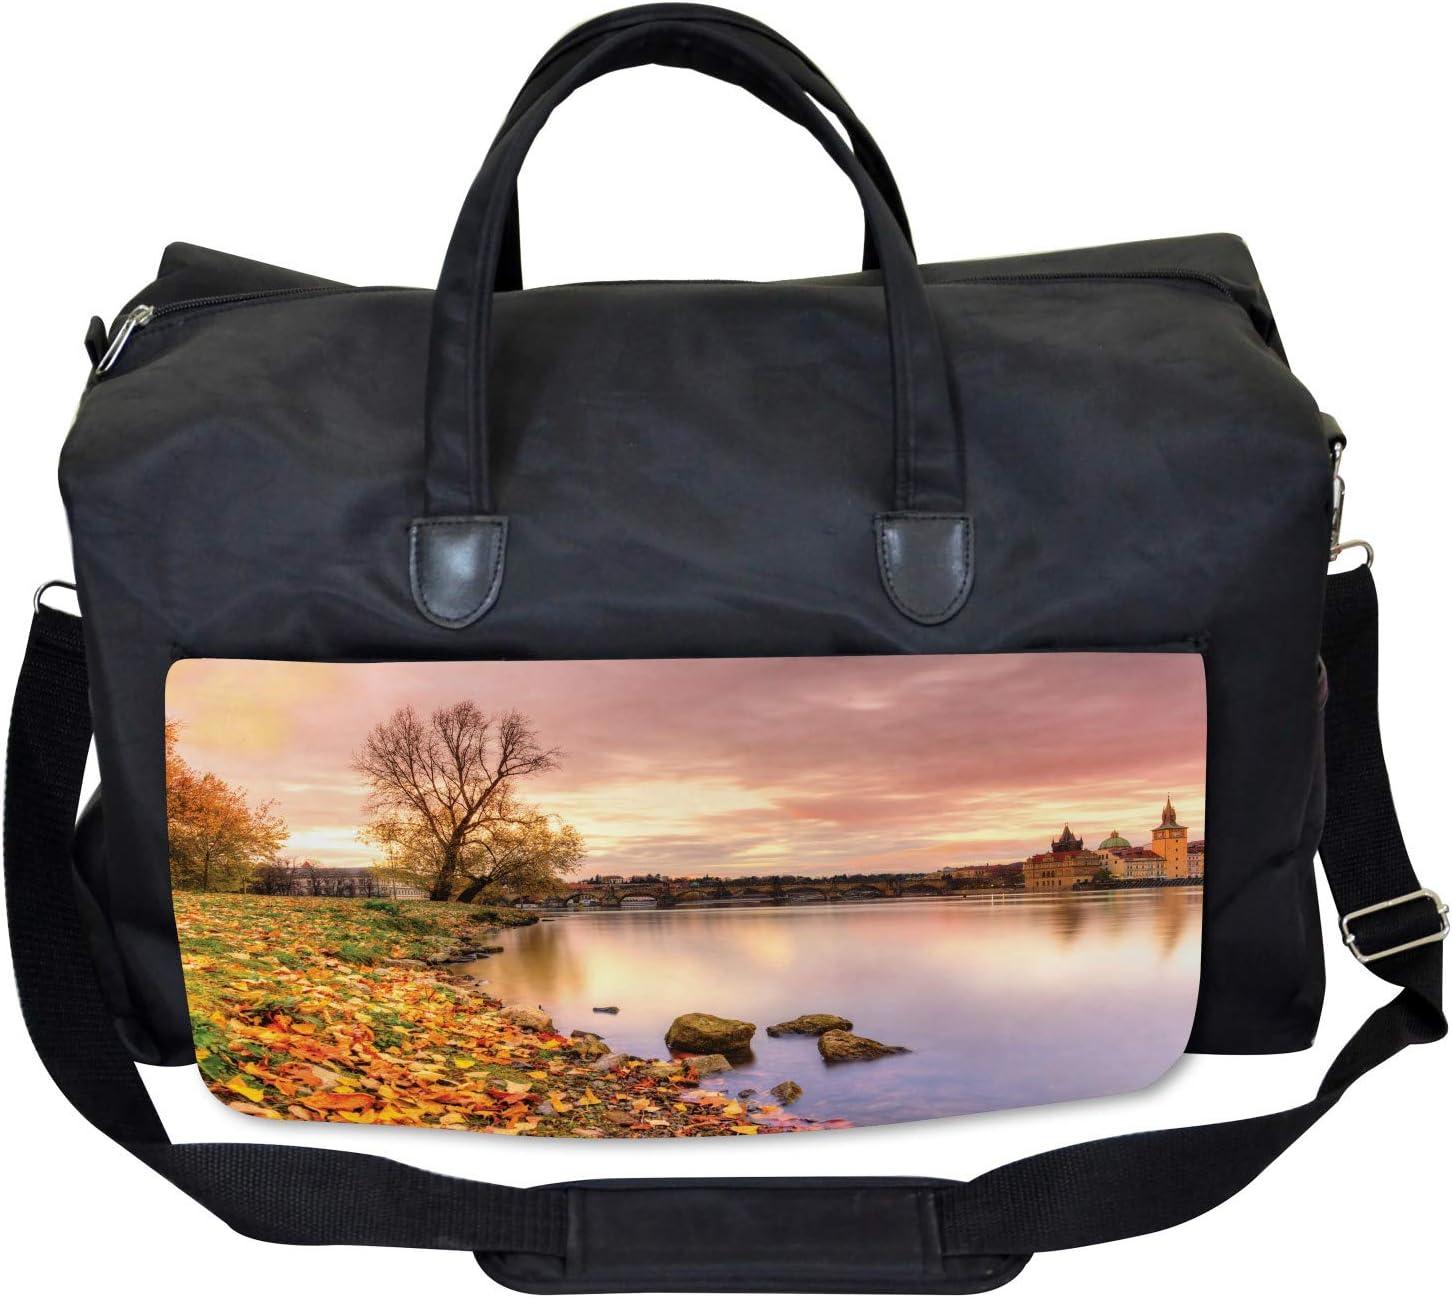 Ambesonne City Gym Bag Large Weekender Carry-on Prague Riverside Autumn